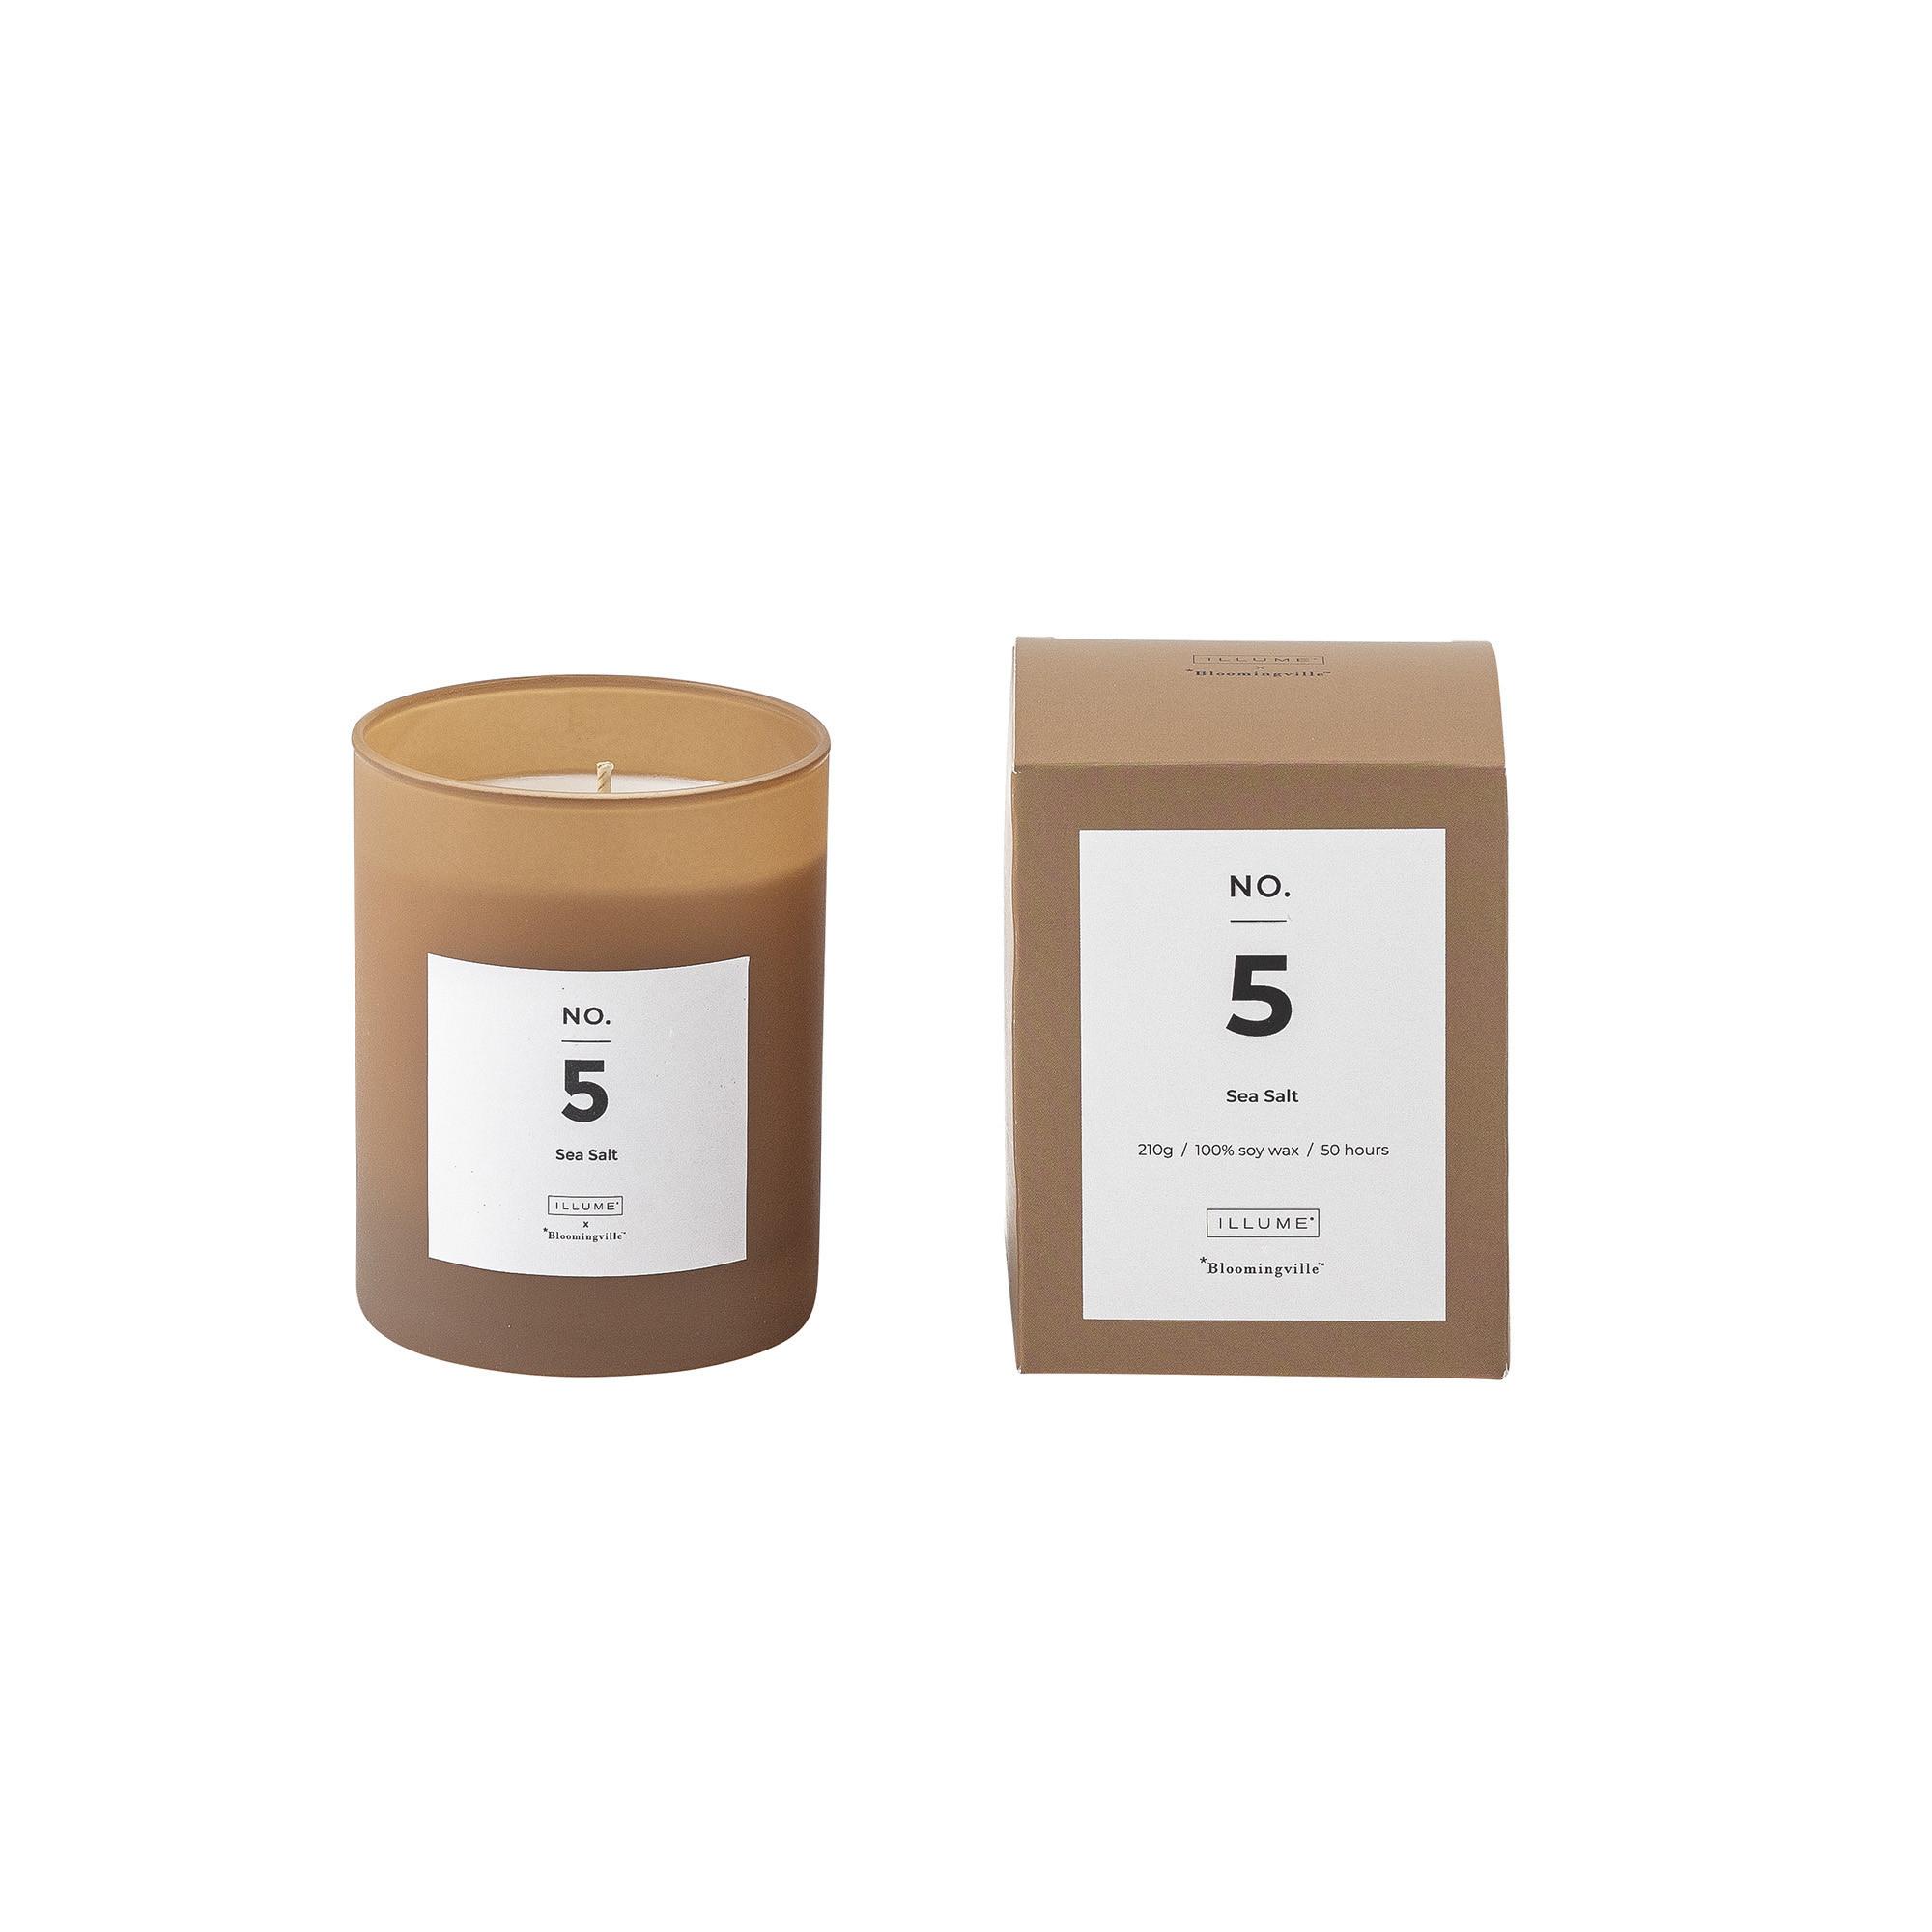 NO. 5 Duftlys – Sea Salt